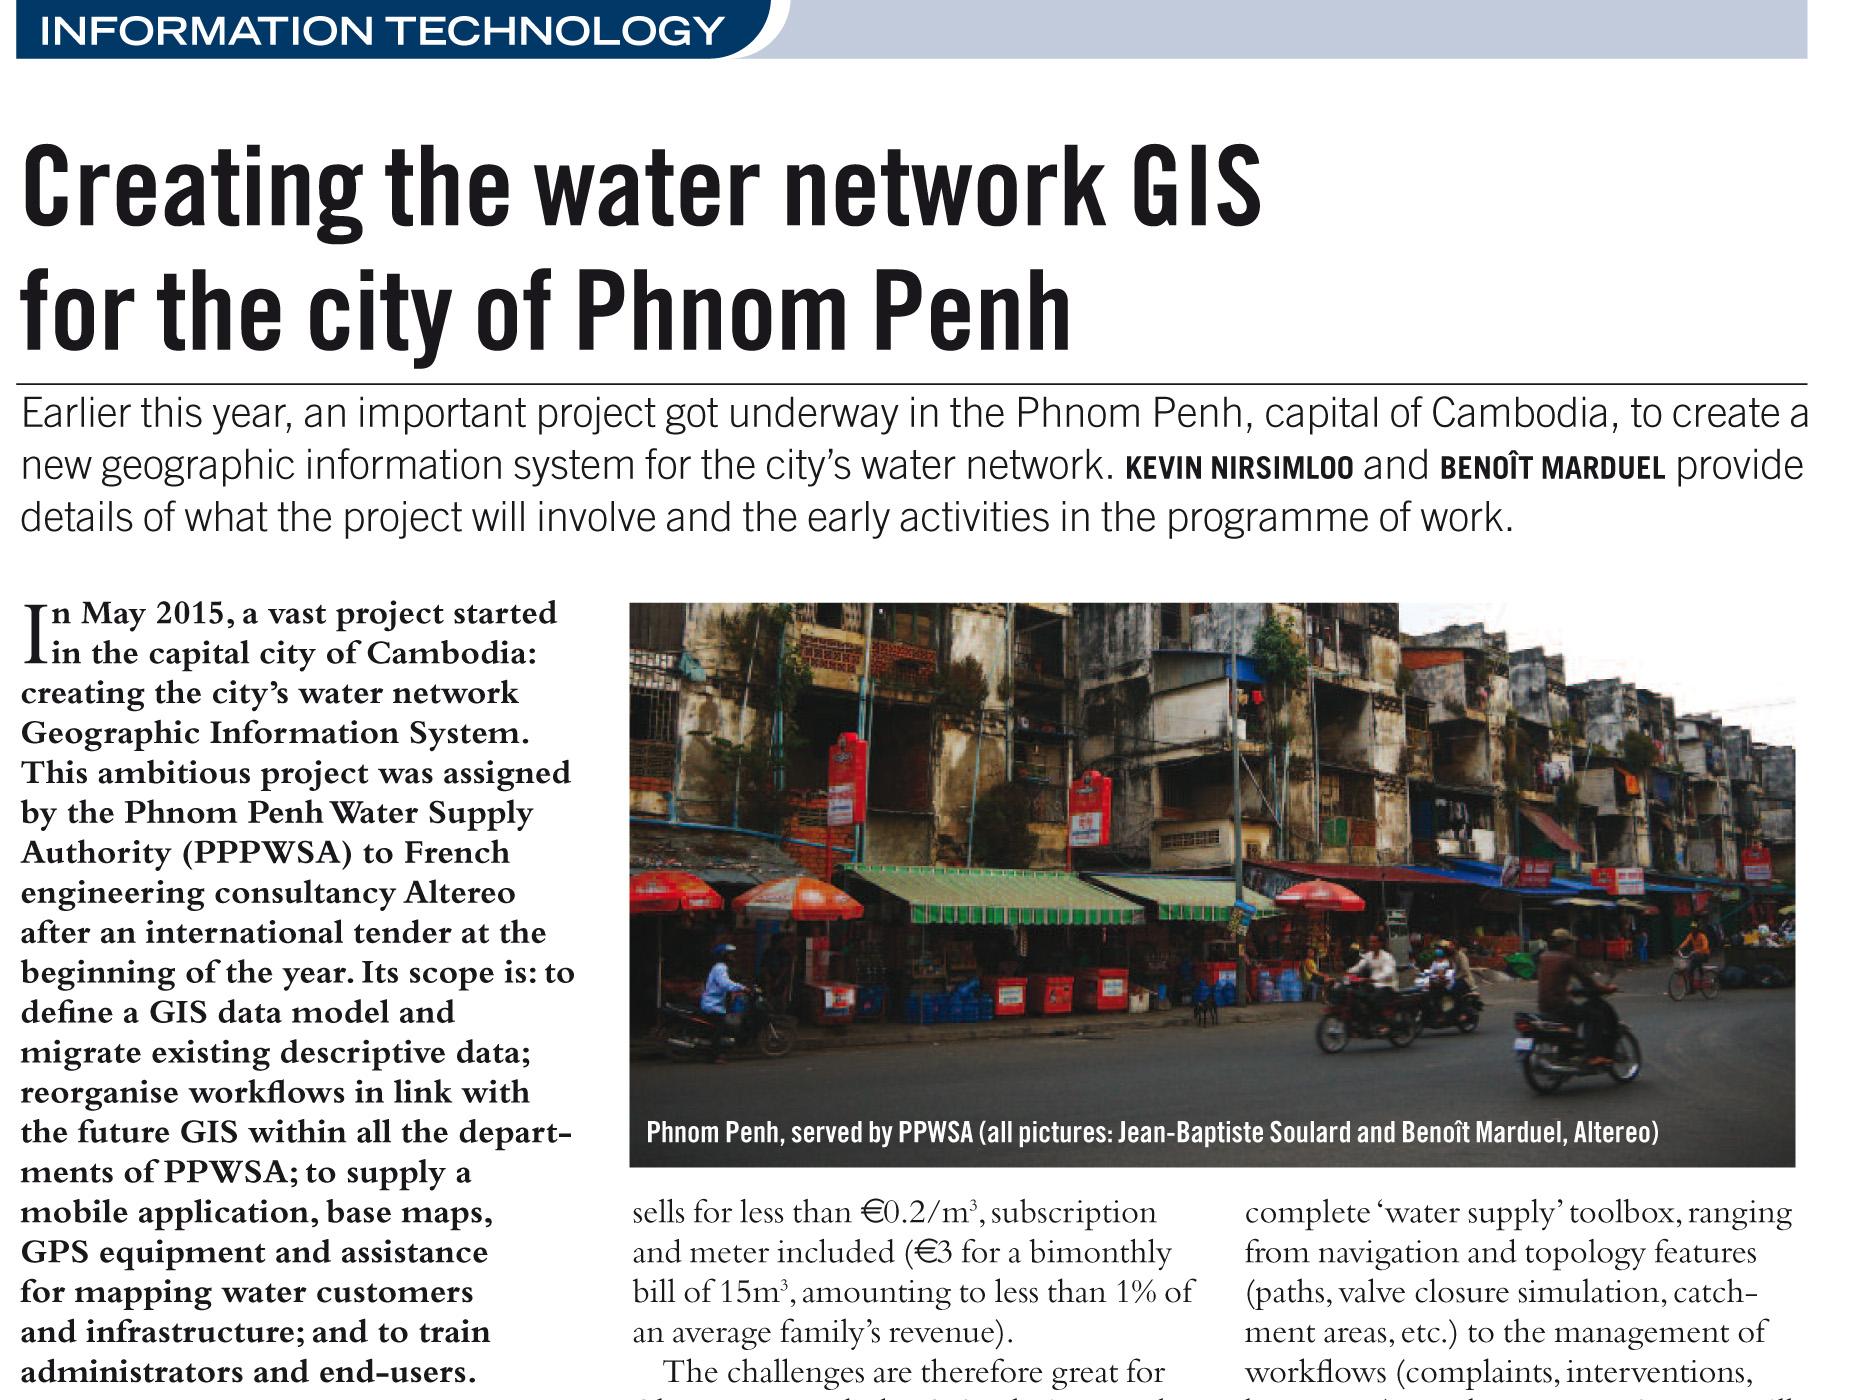 Altereo Presse IWA WUMI KIS Phnom Penh